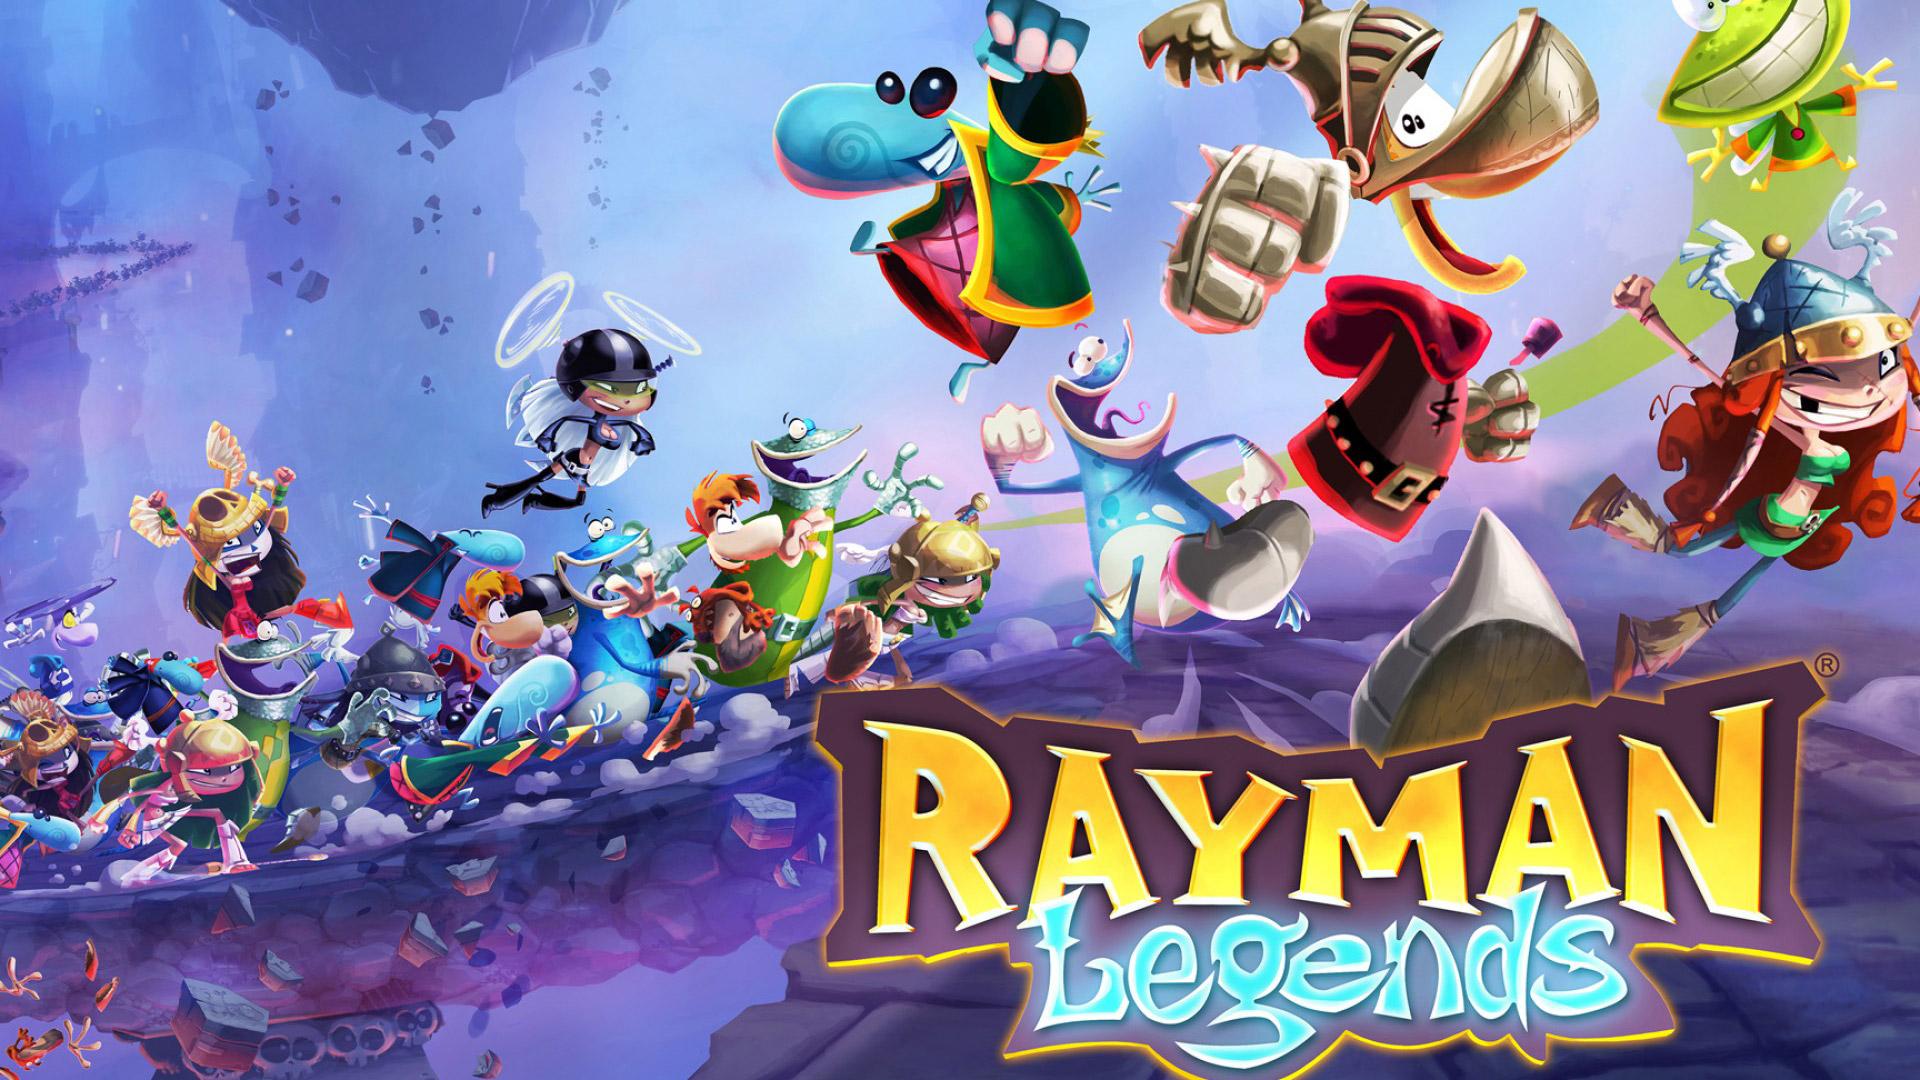 Free Rayman Legends Wallpaper in 1920x1080